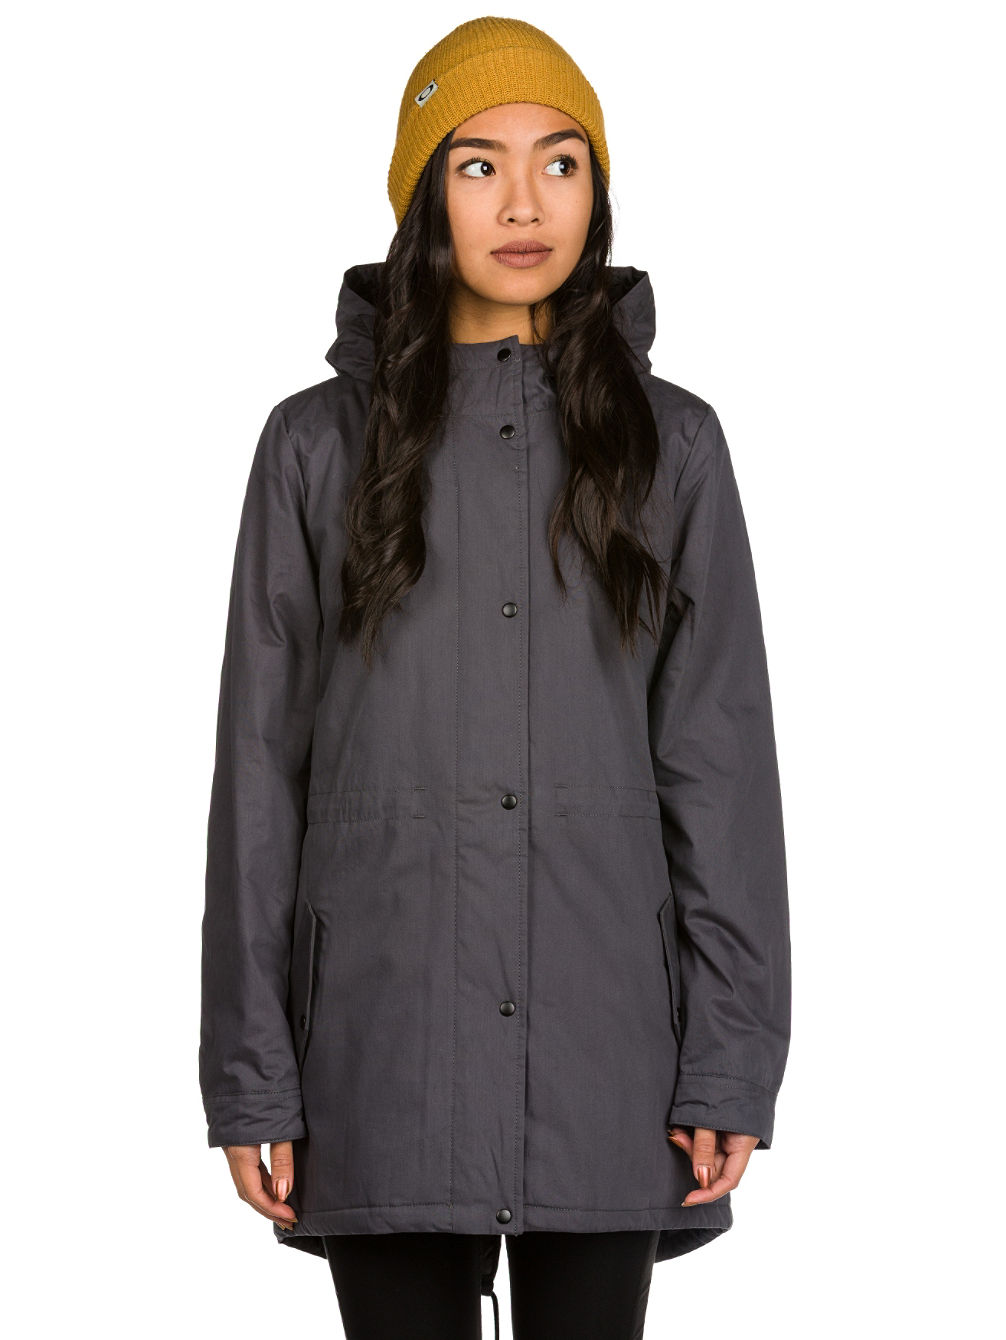 vans-addison-parka-mte-jacket